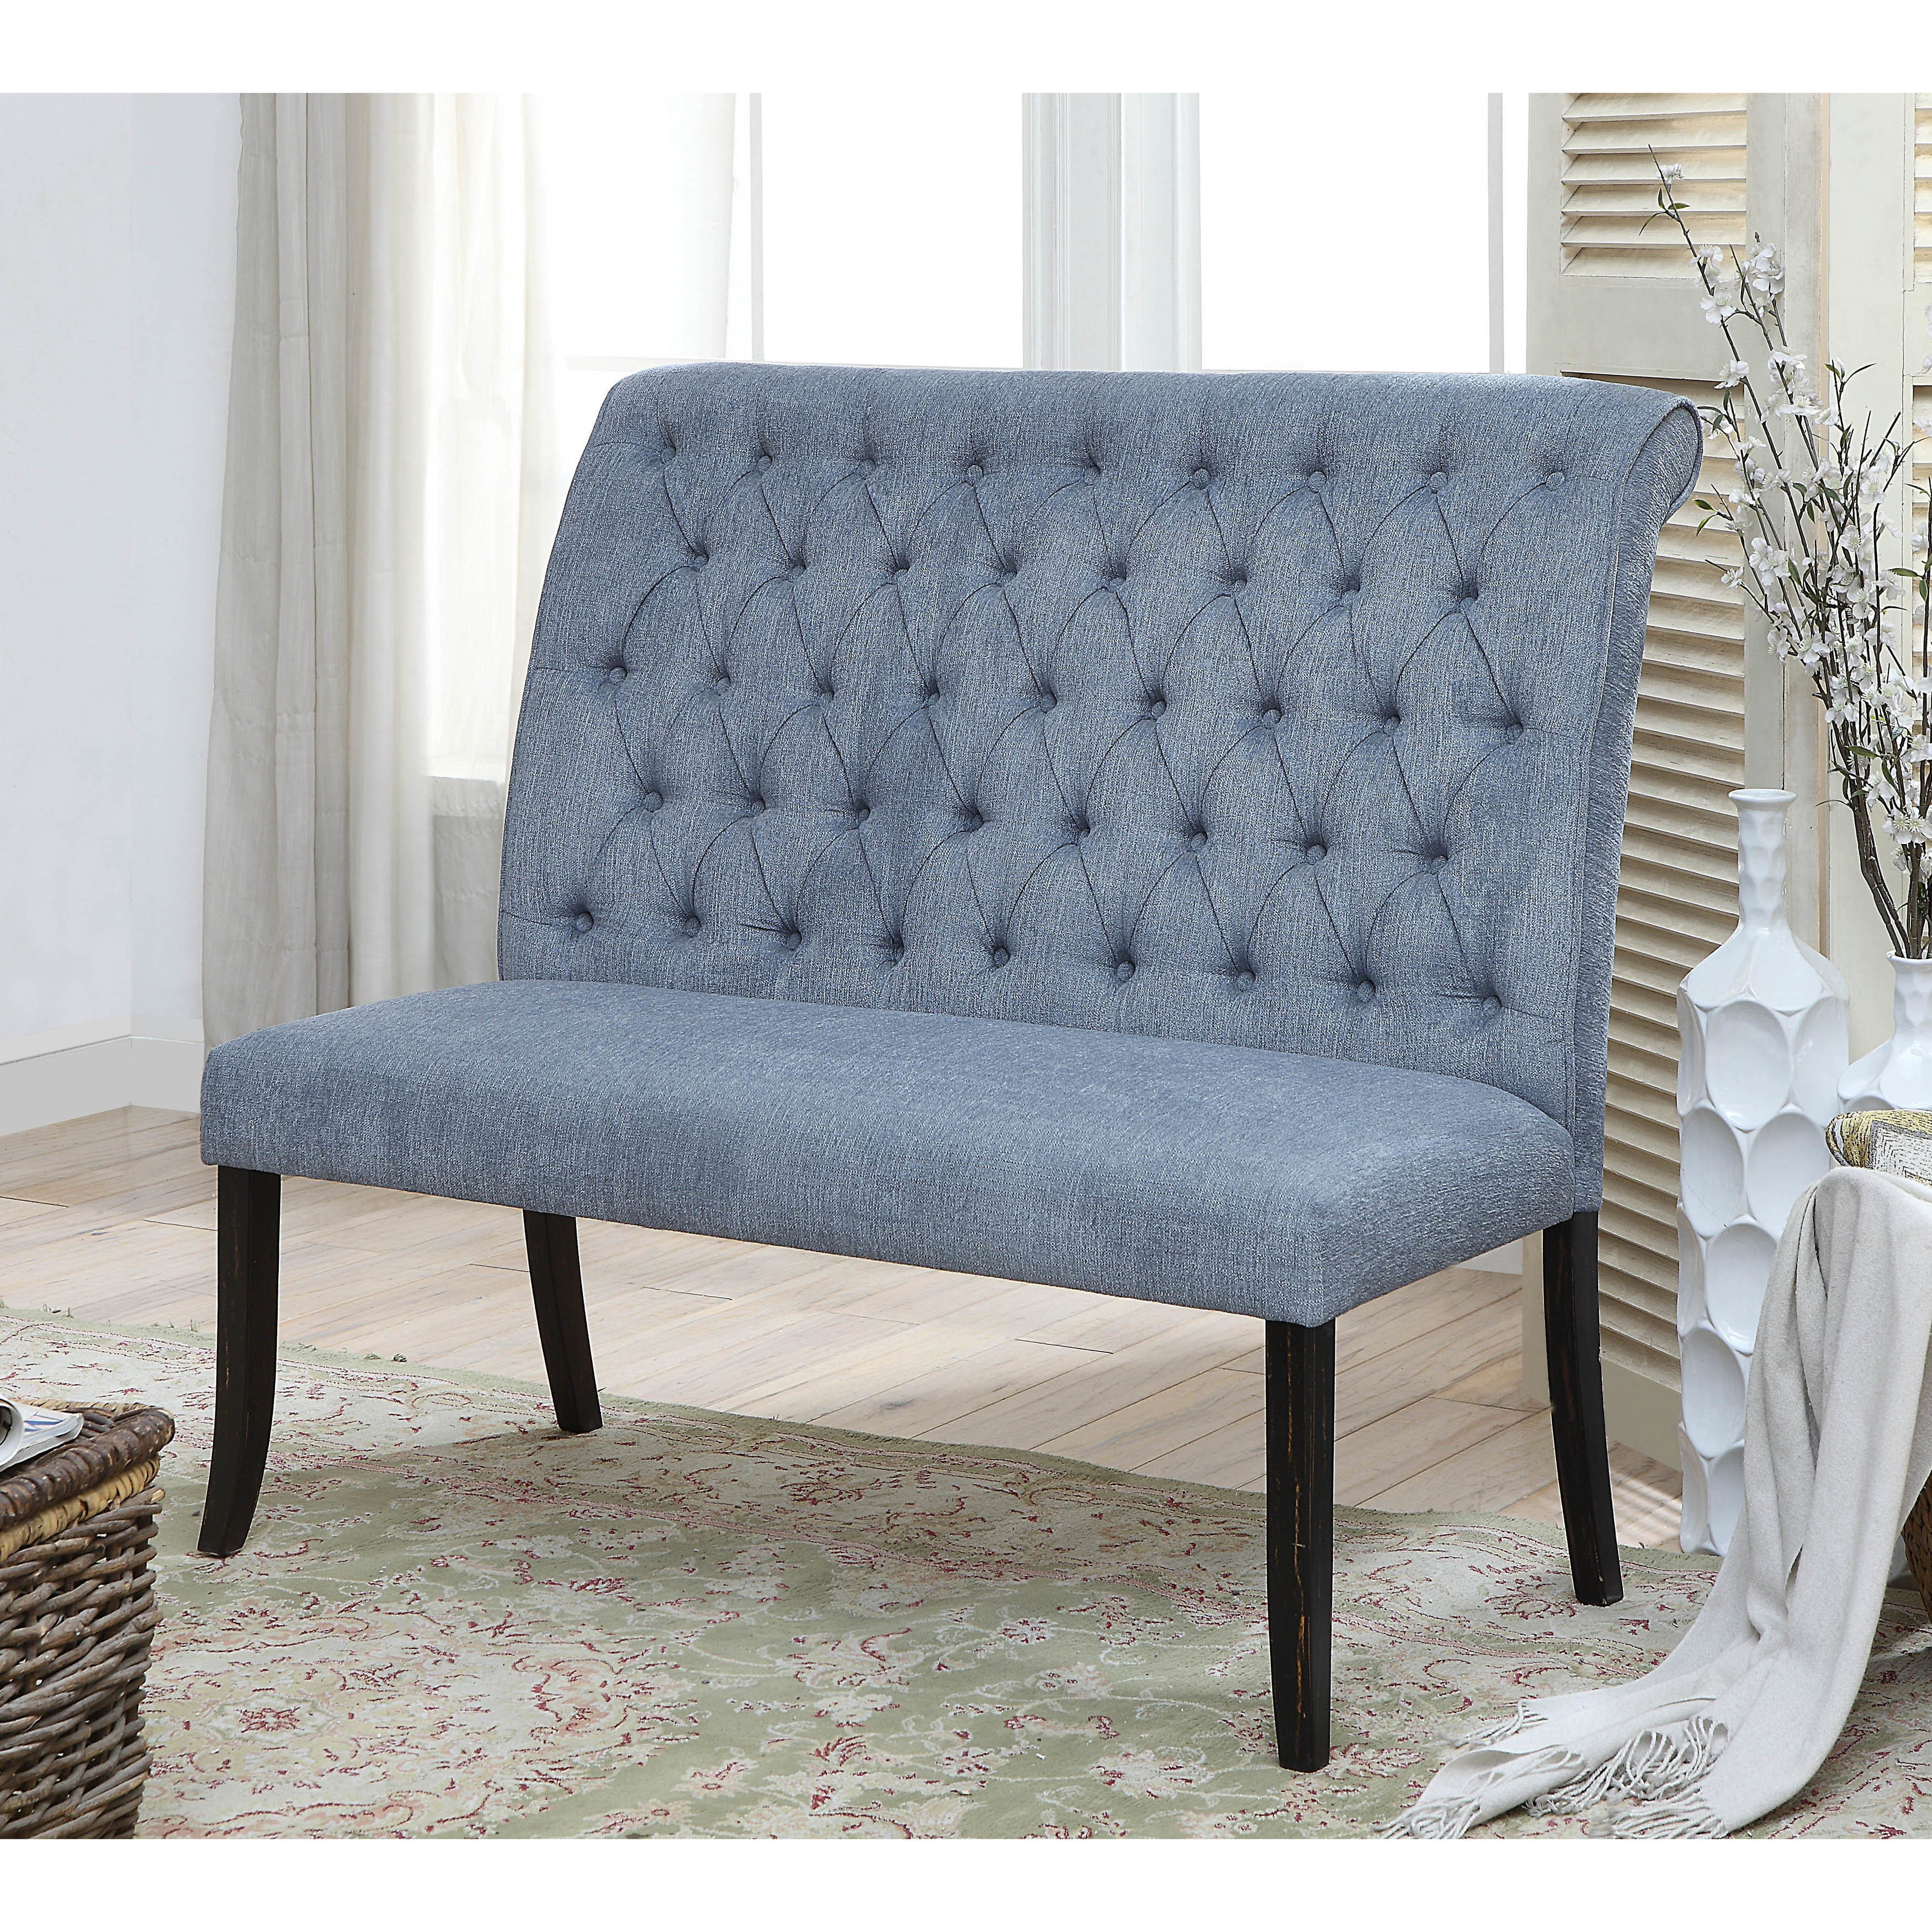 Stupendous Gracewood Hollow Suyin Contemporary Button Tufted Chenille 2 Machost Co Dining Chair Design Ideas Machostcouk